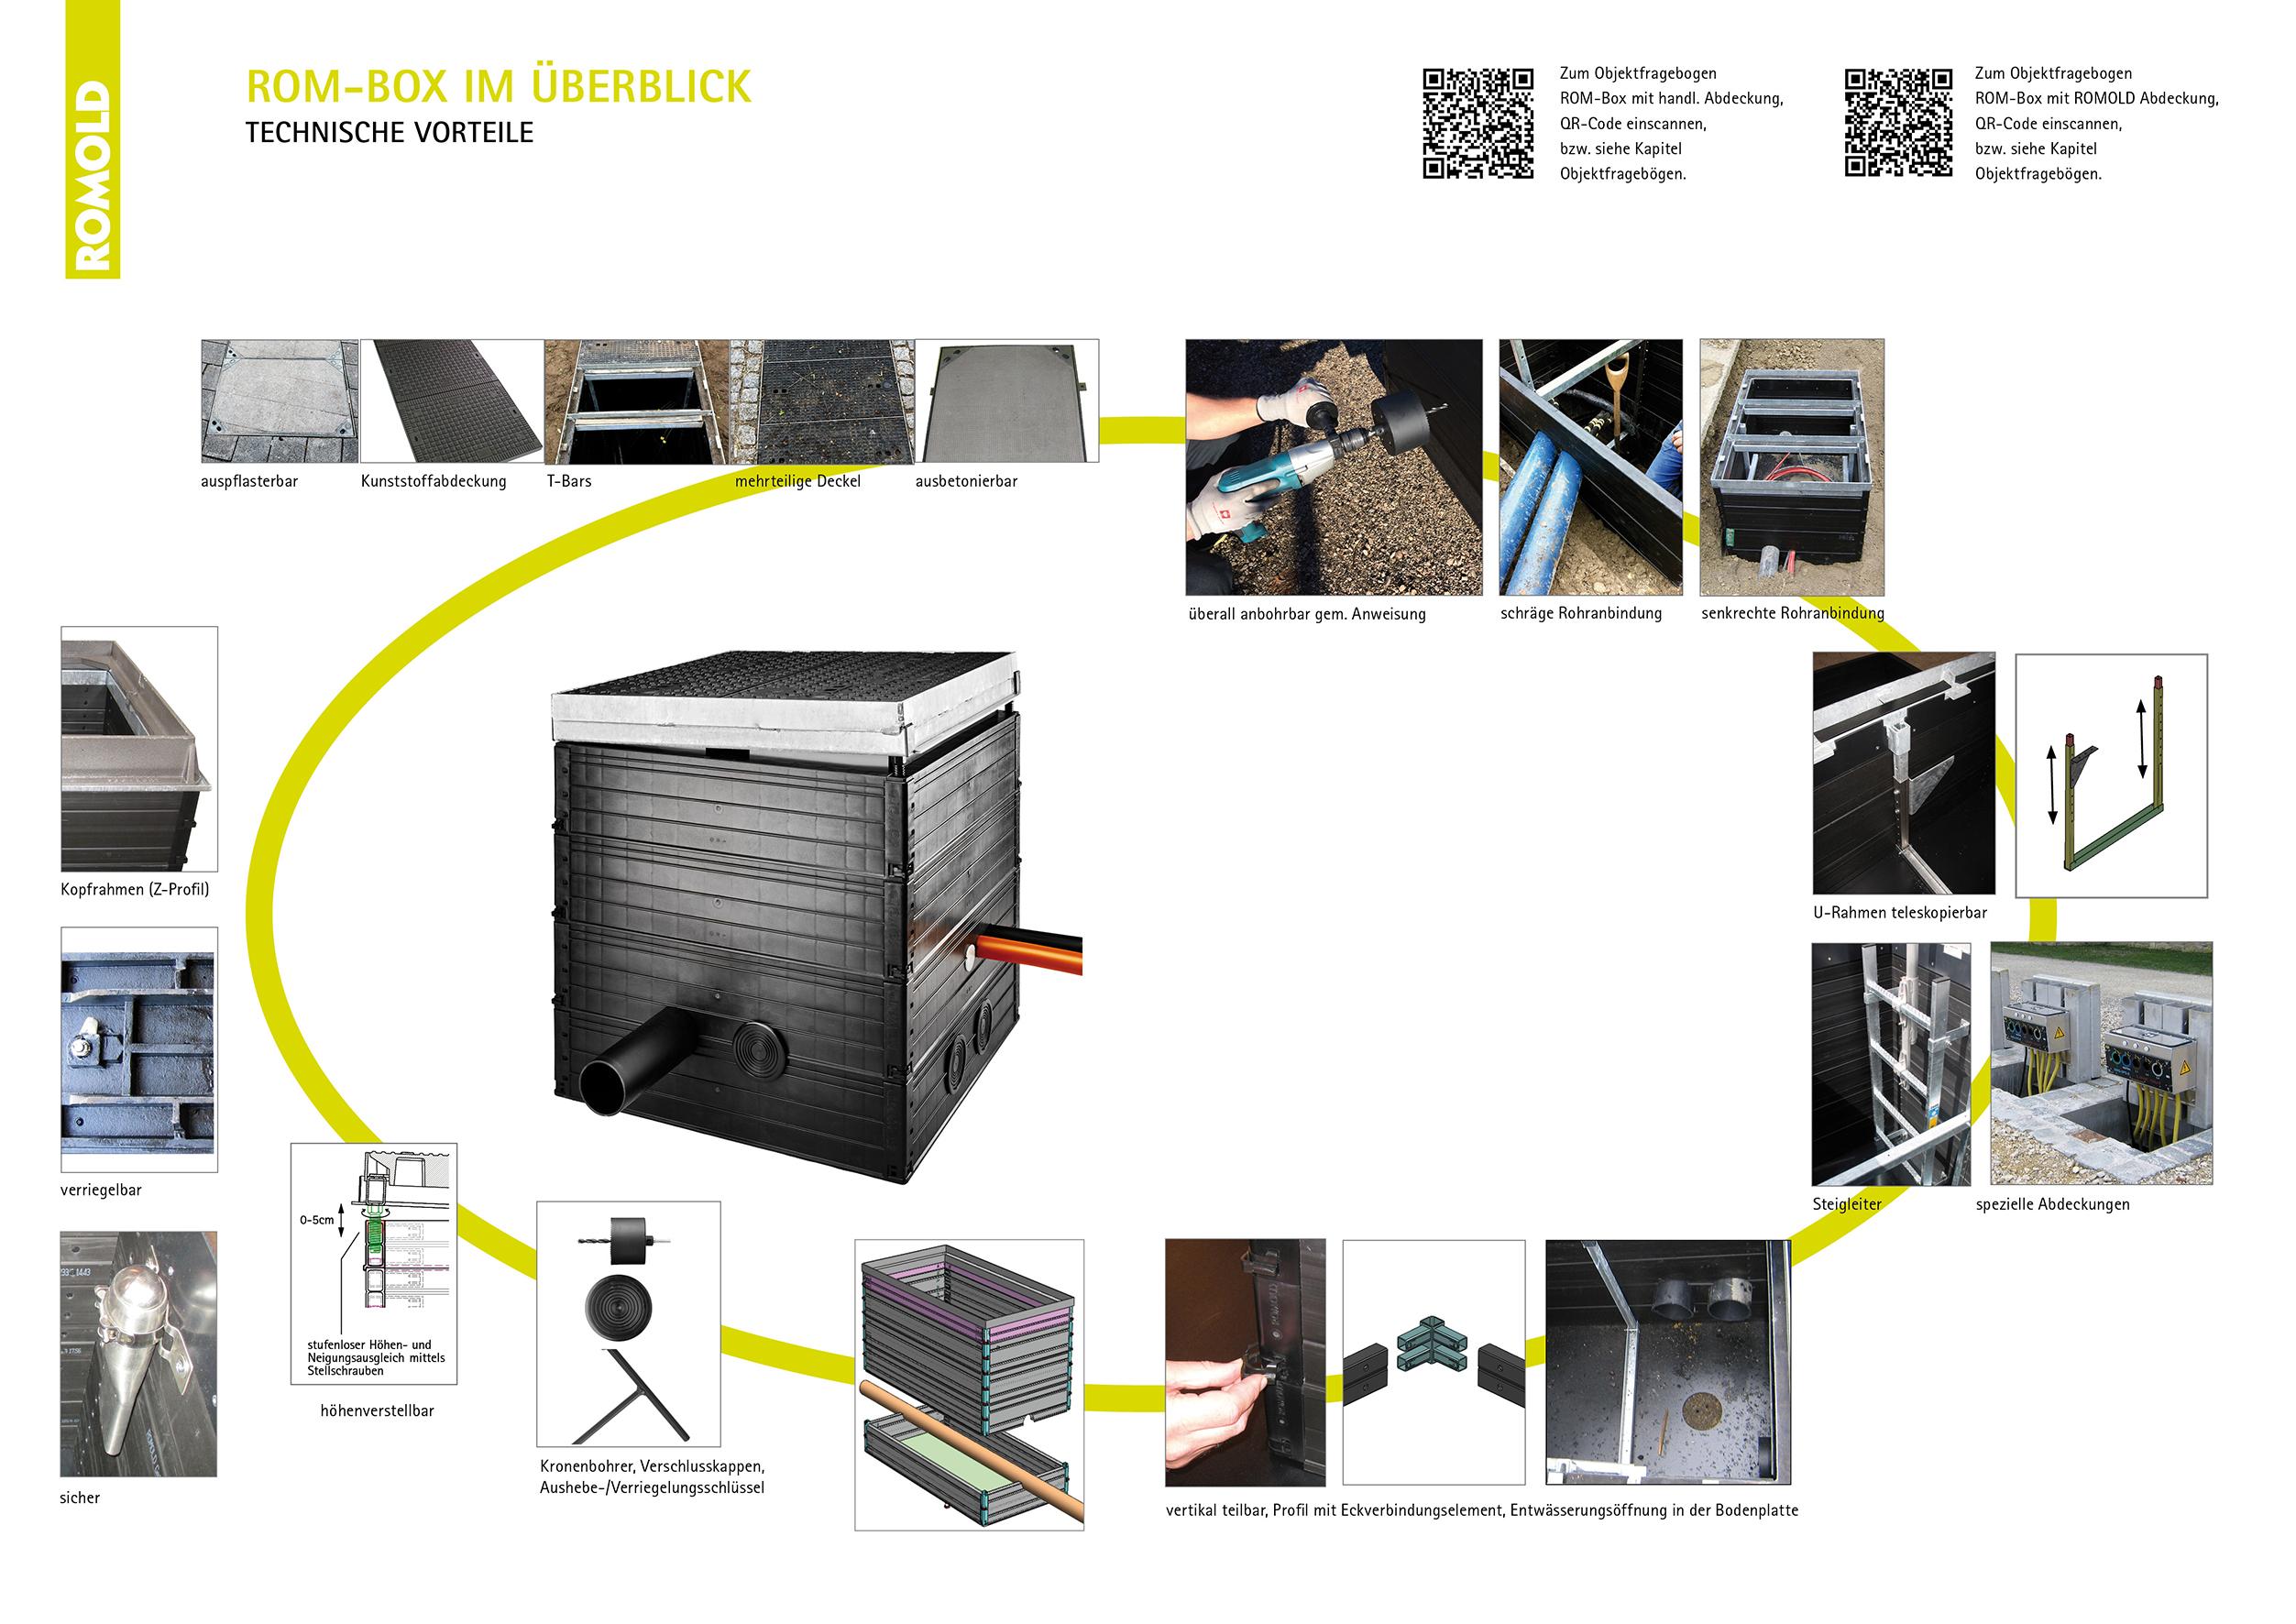 ROMOLD_Ueberblick_ROM-Box